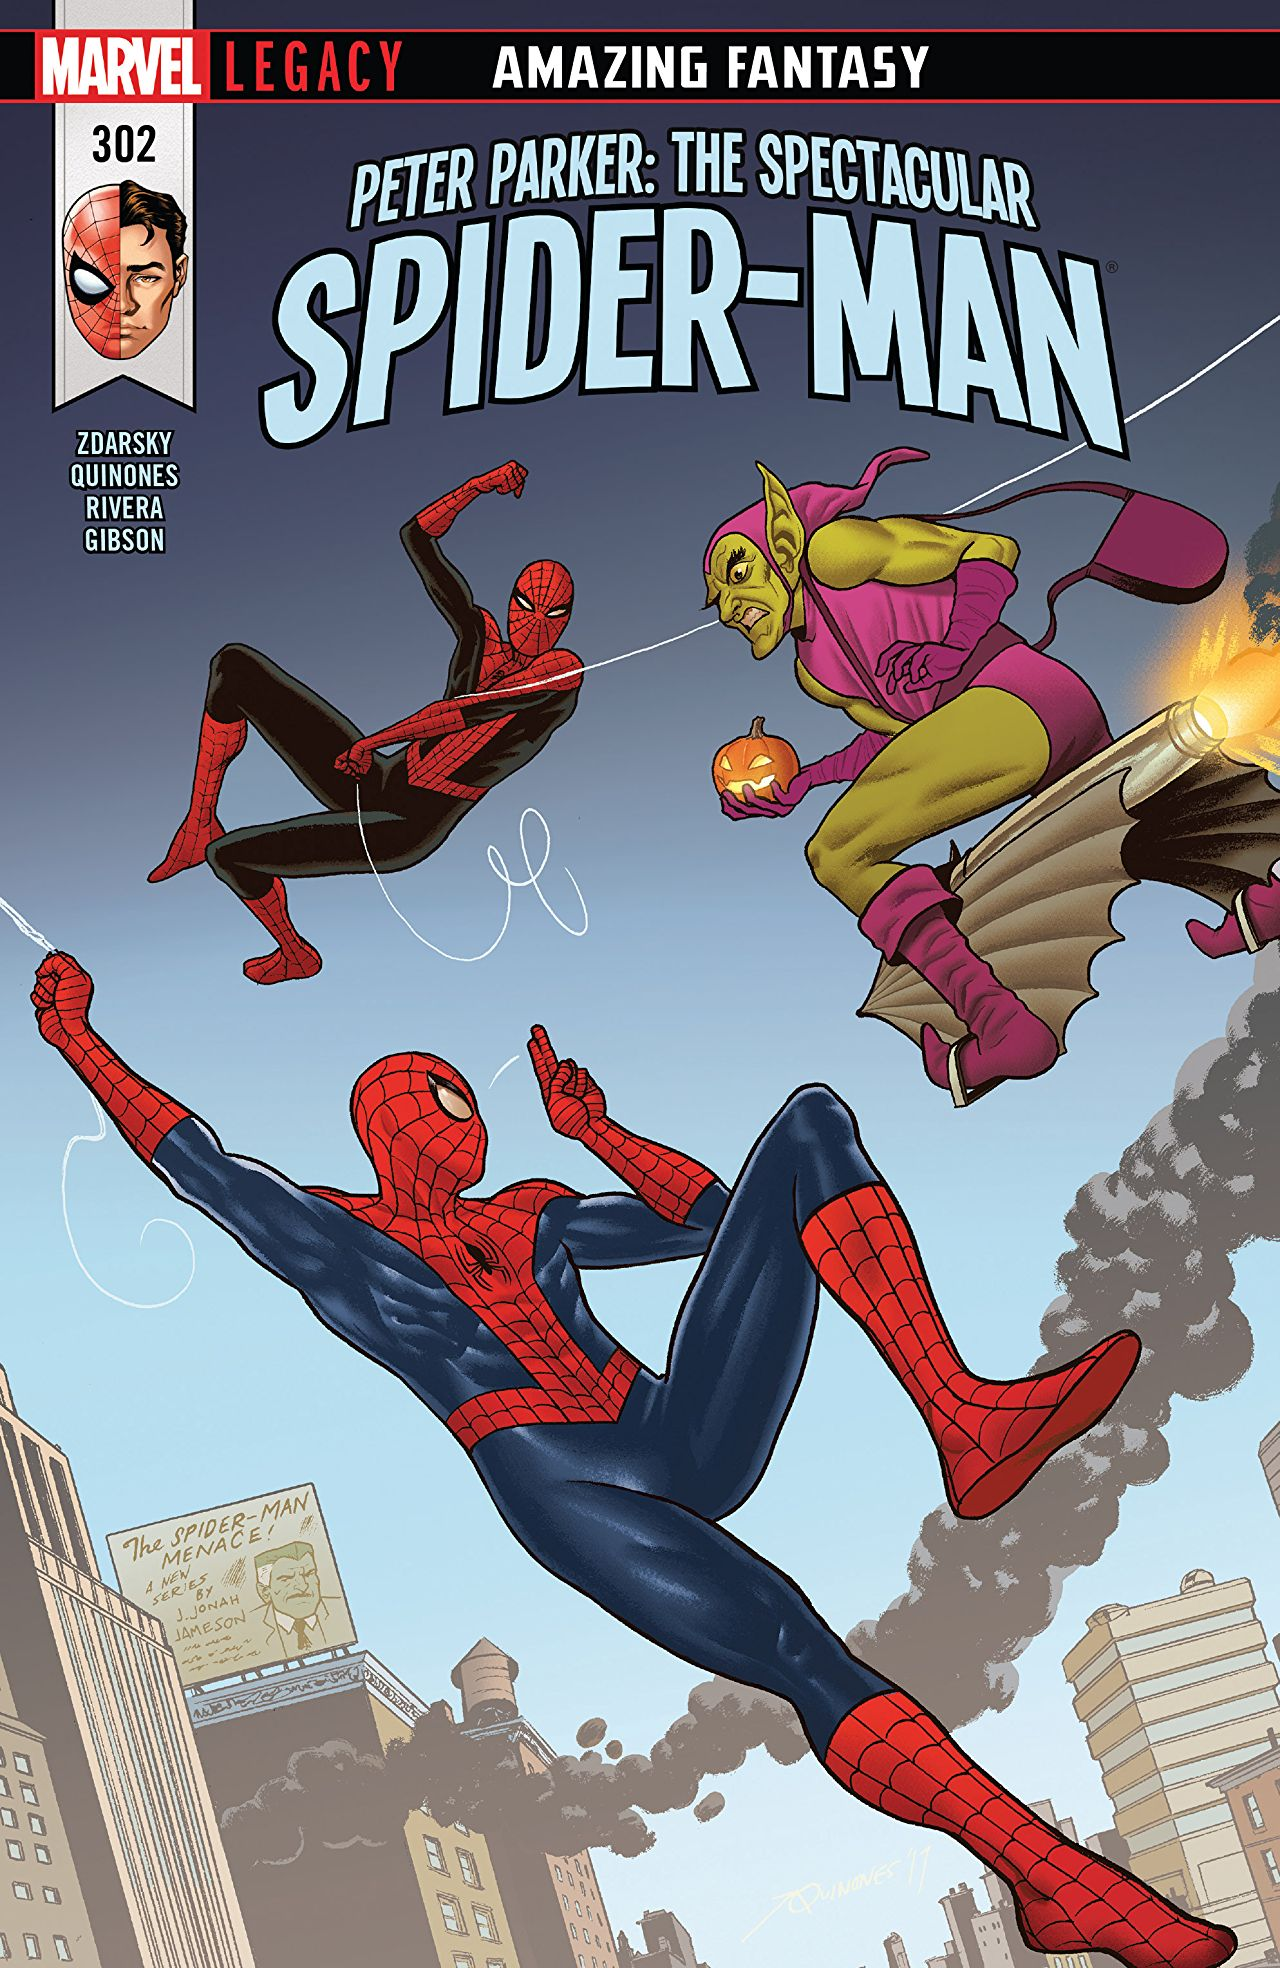 Peter Parker - The Spectacular Spider-Man 302